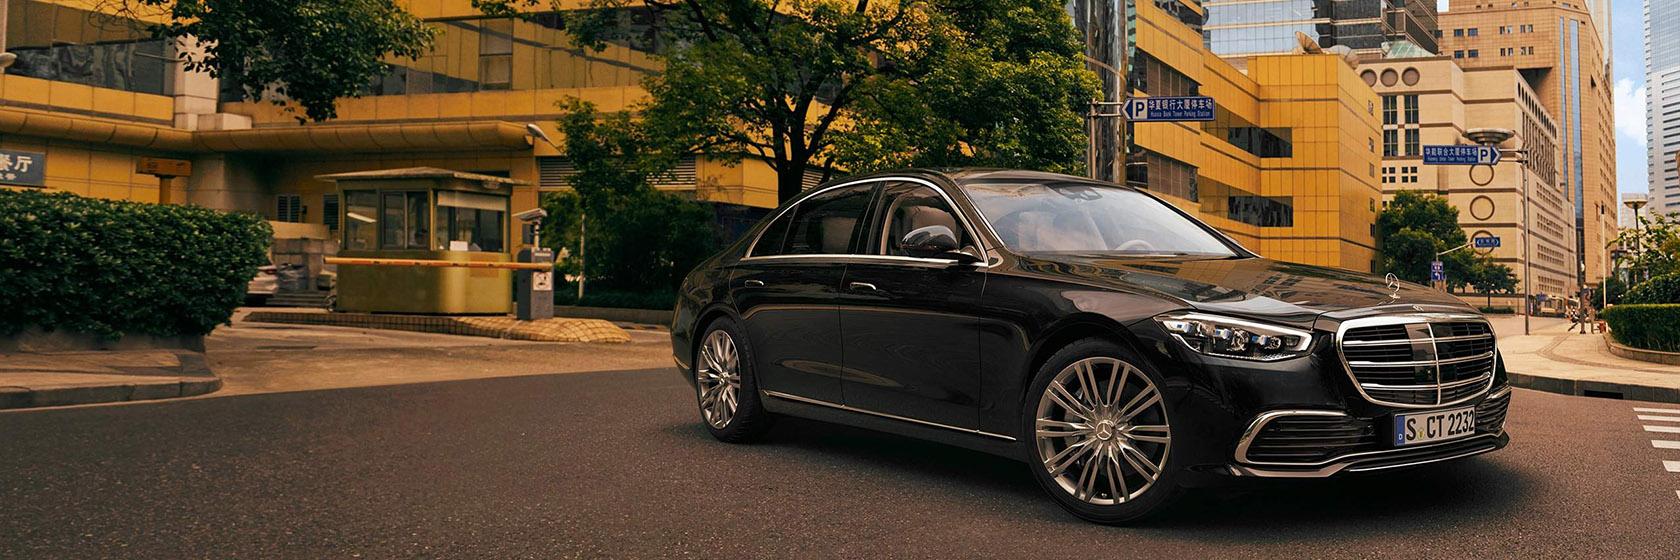 Безпека нового Mercedes-Benz S-Class Sedan wv223 2021